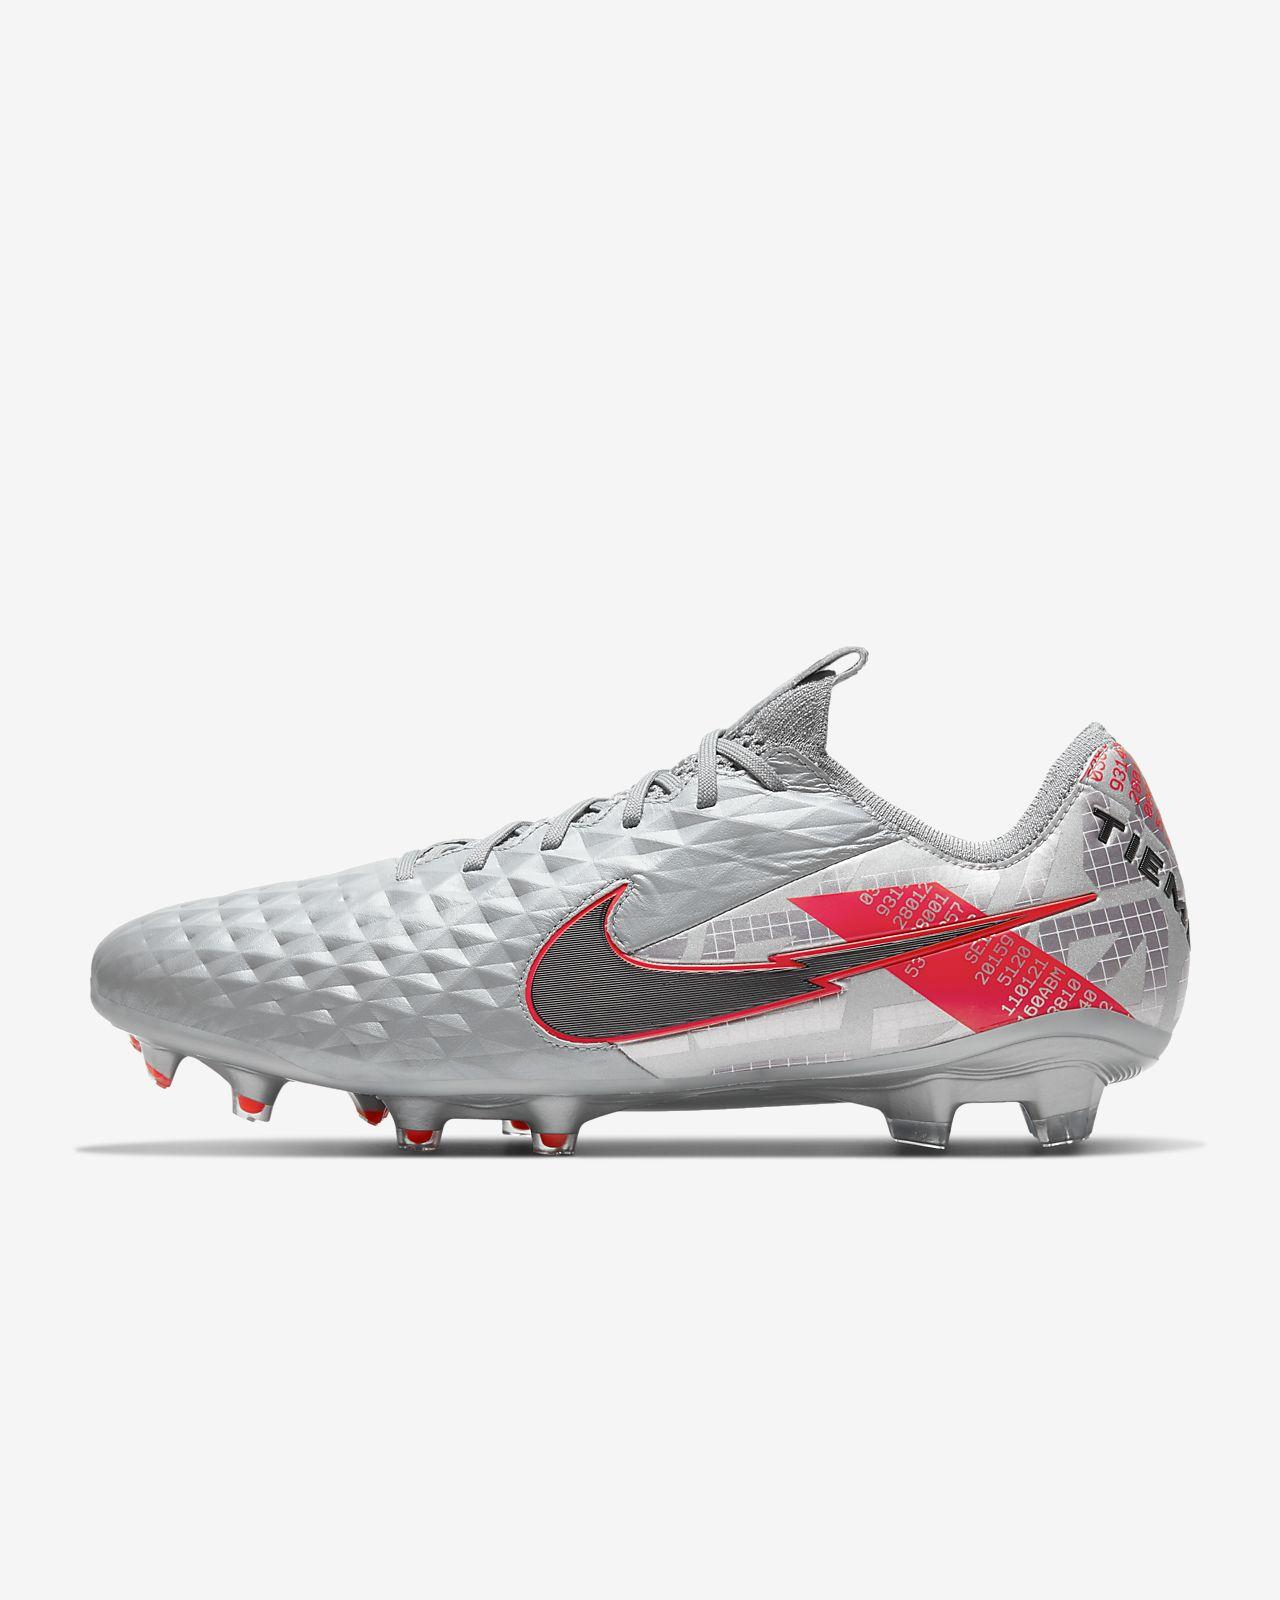 Köp Nike Tiempo Fotbollsskor Online. Nike SE